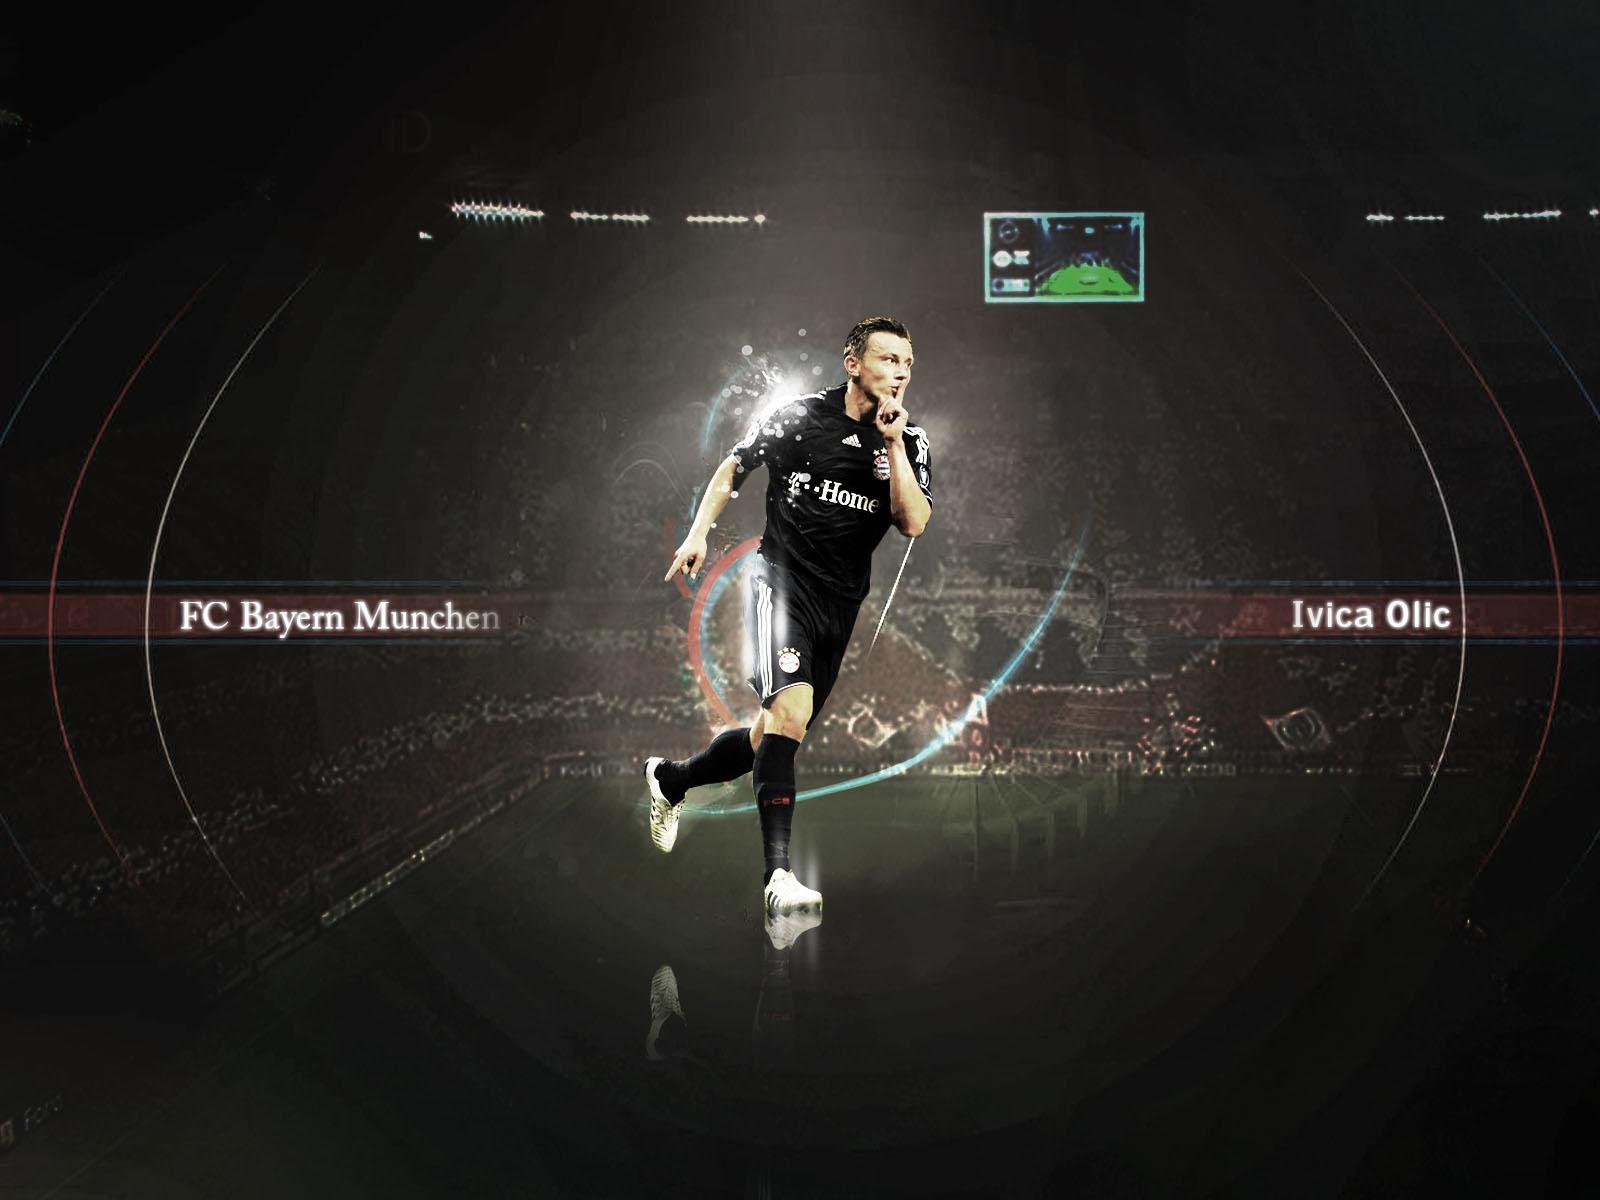 Sport Wallpaper Posts: Ivica Olic Wallpapers